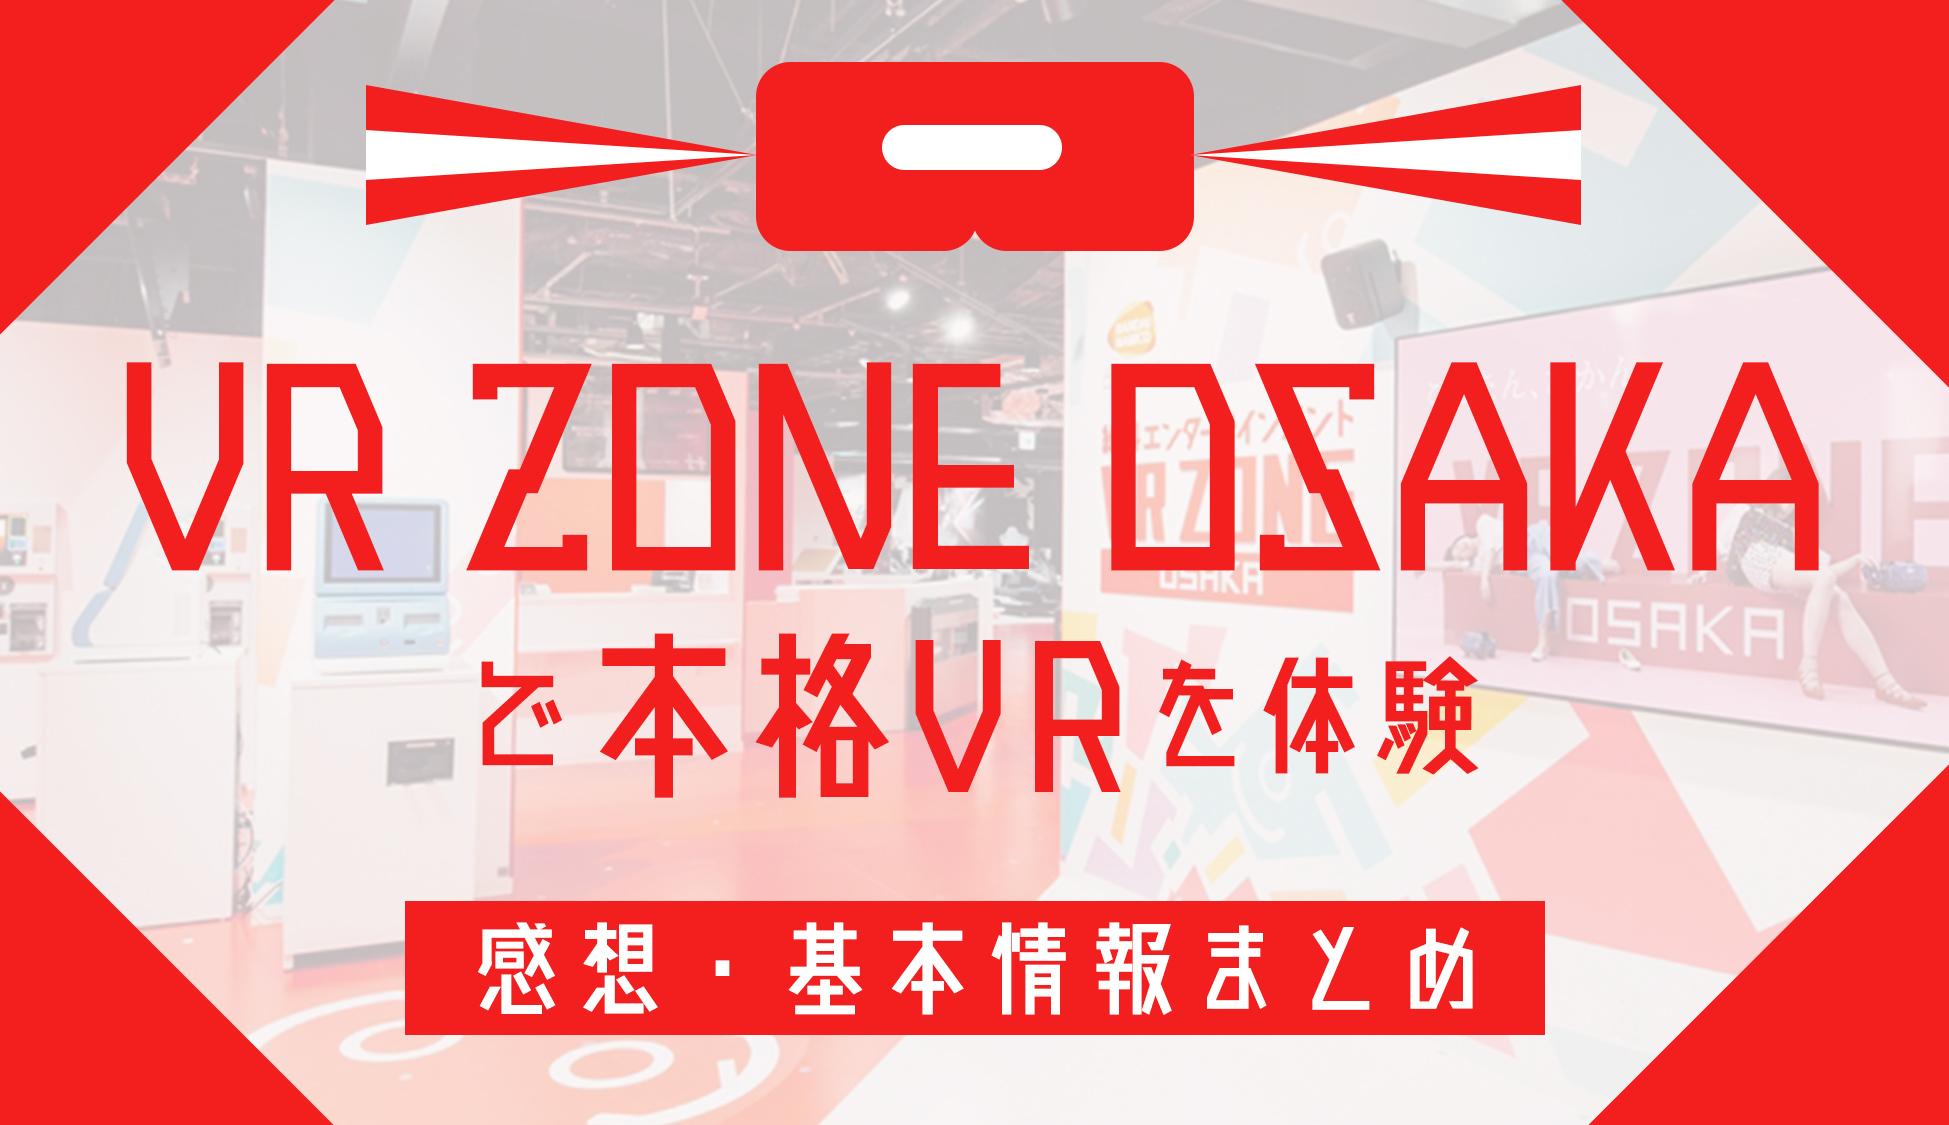 VR ZONE OSAKAで本格VRを体験 感想・基本情報まとめ